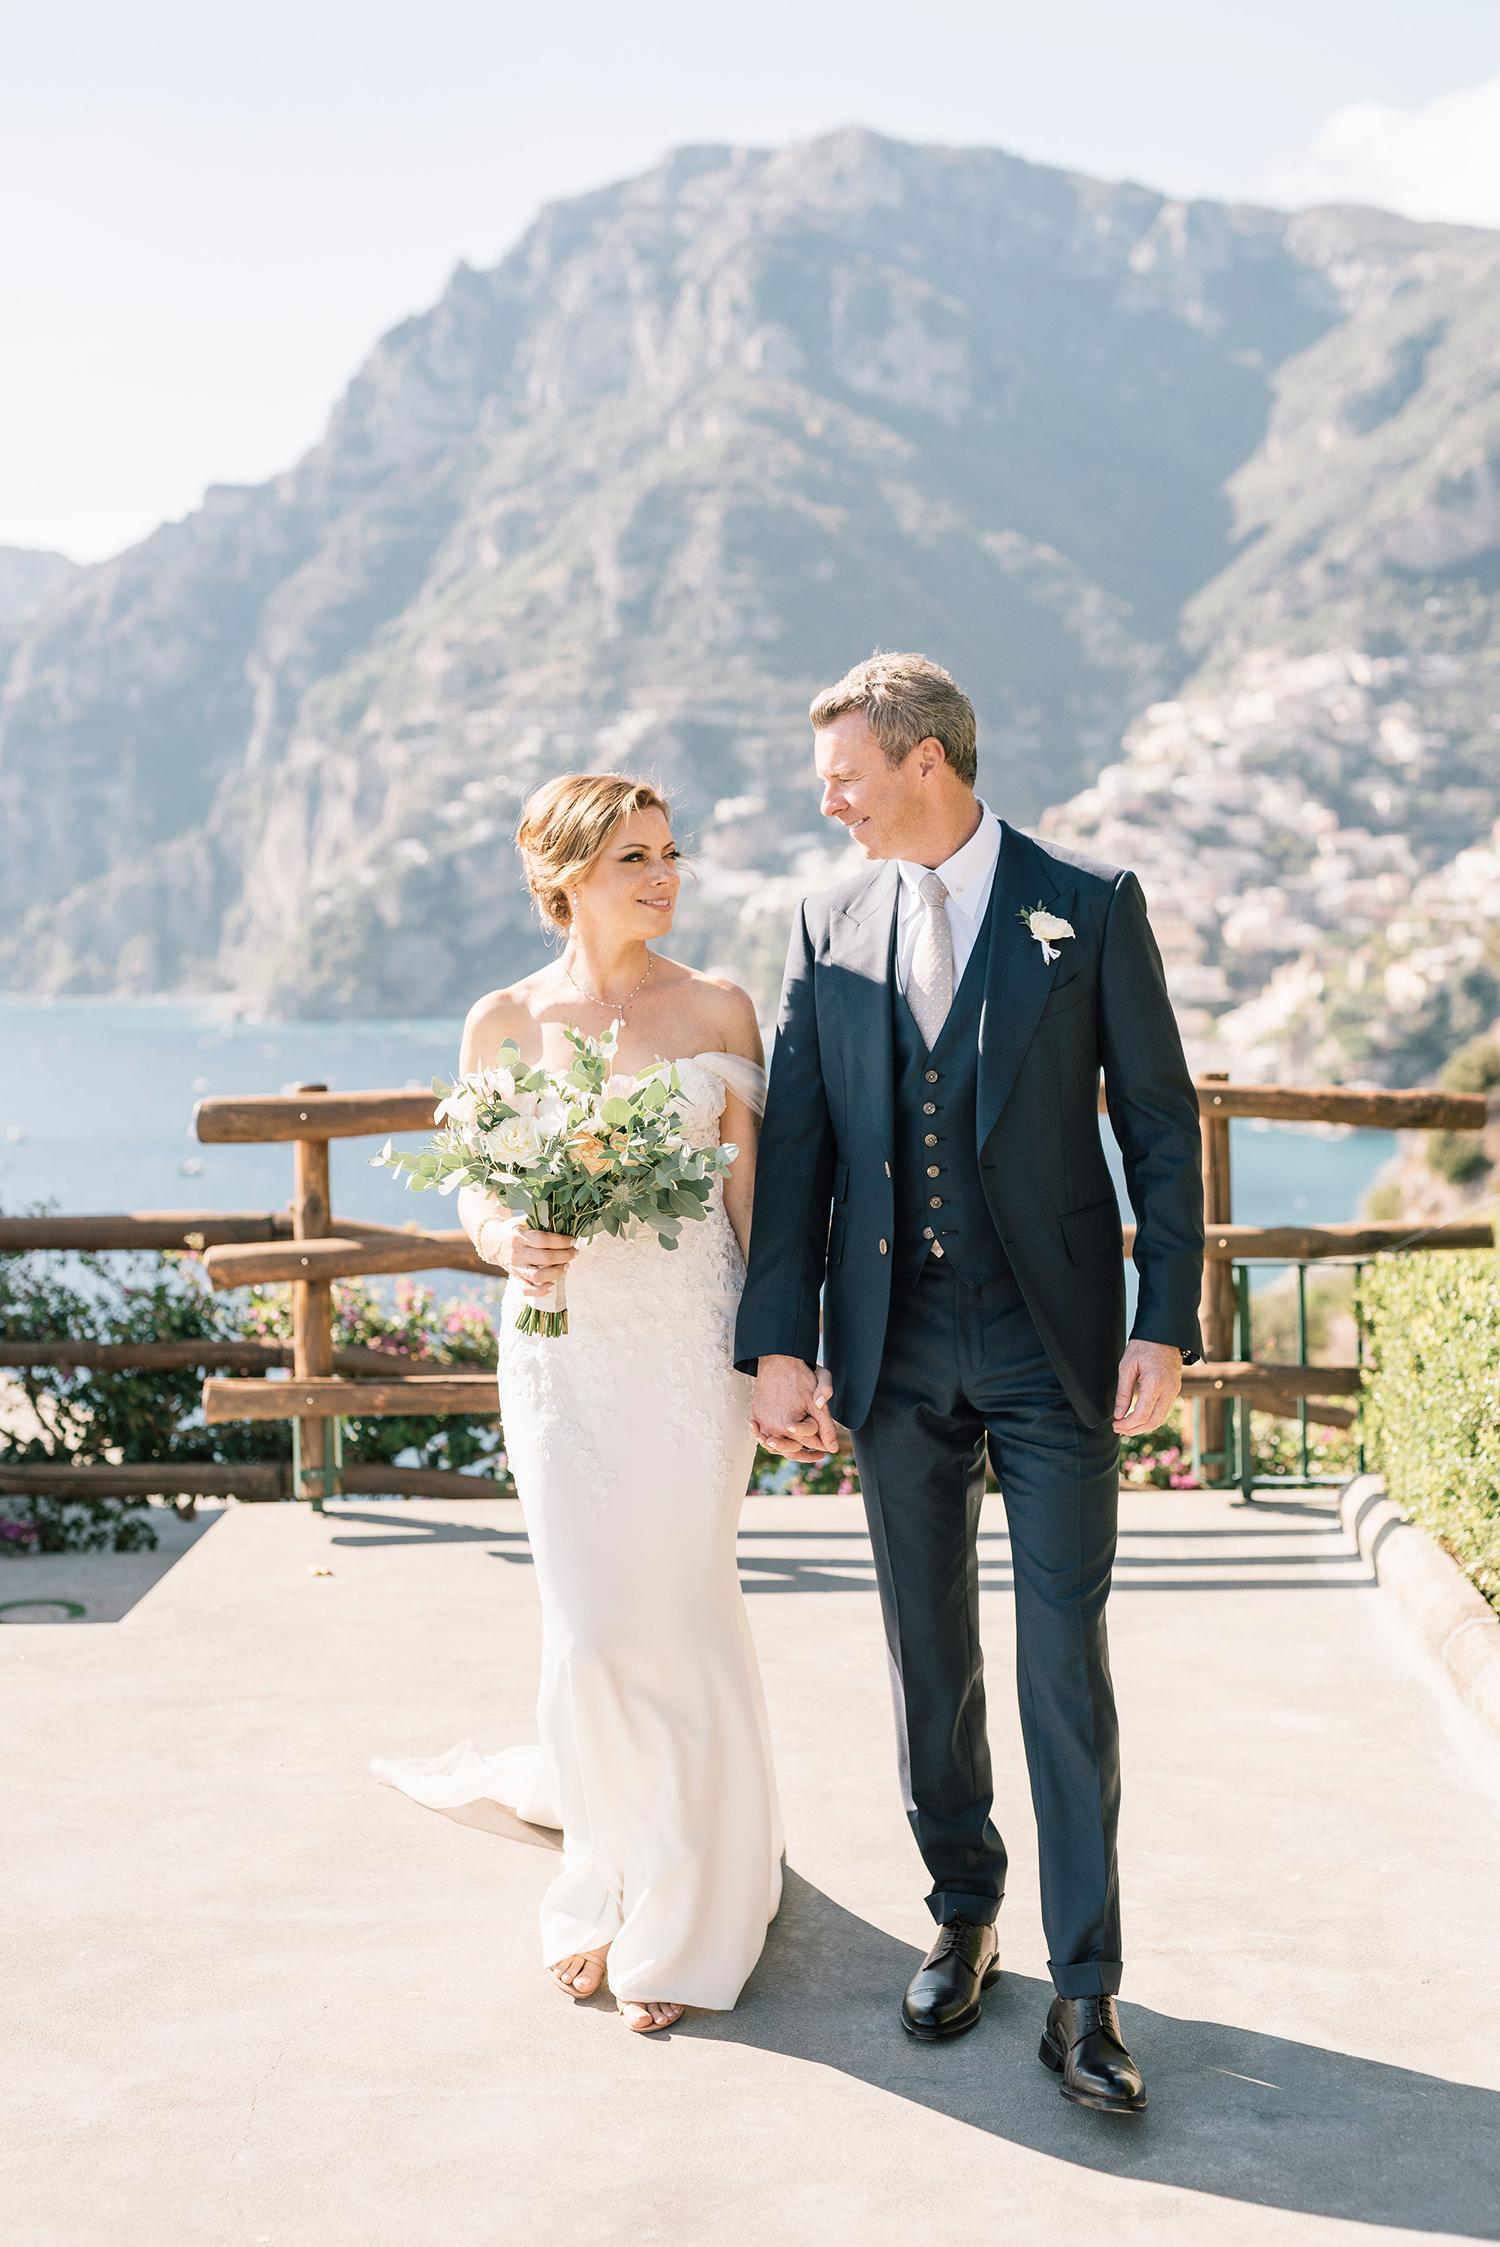 cara david wedding couple holding hands walking